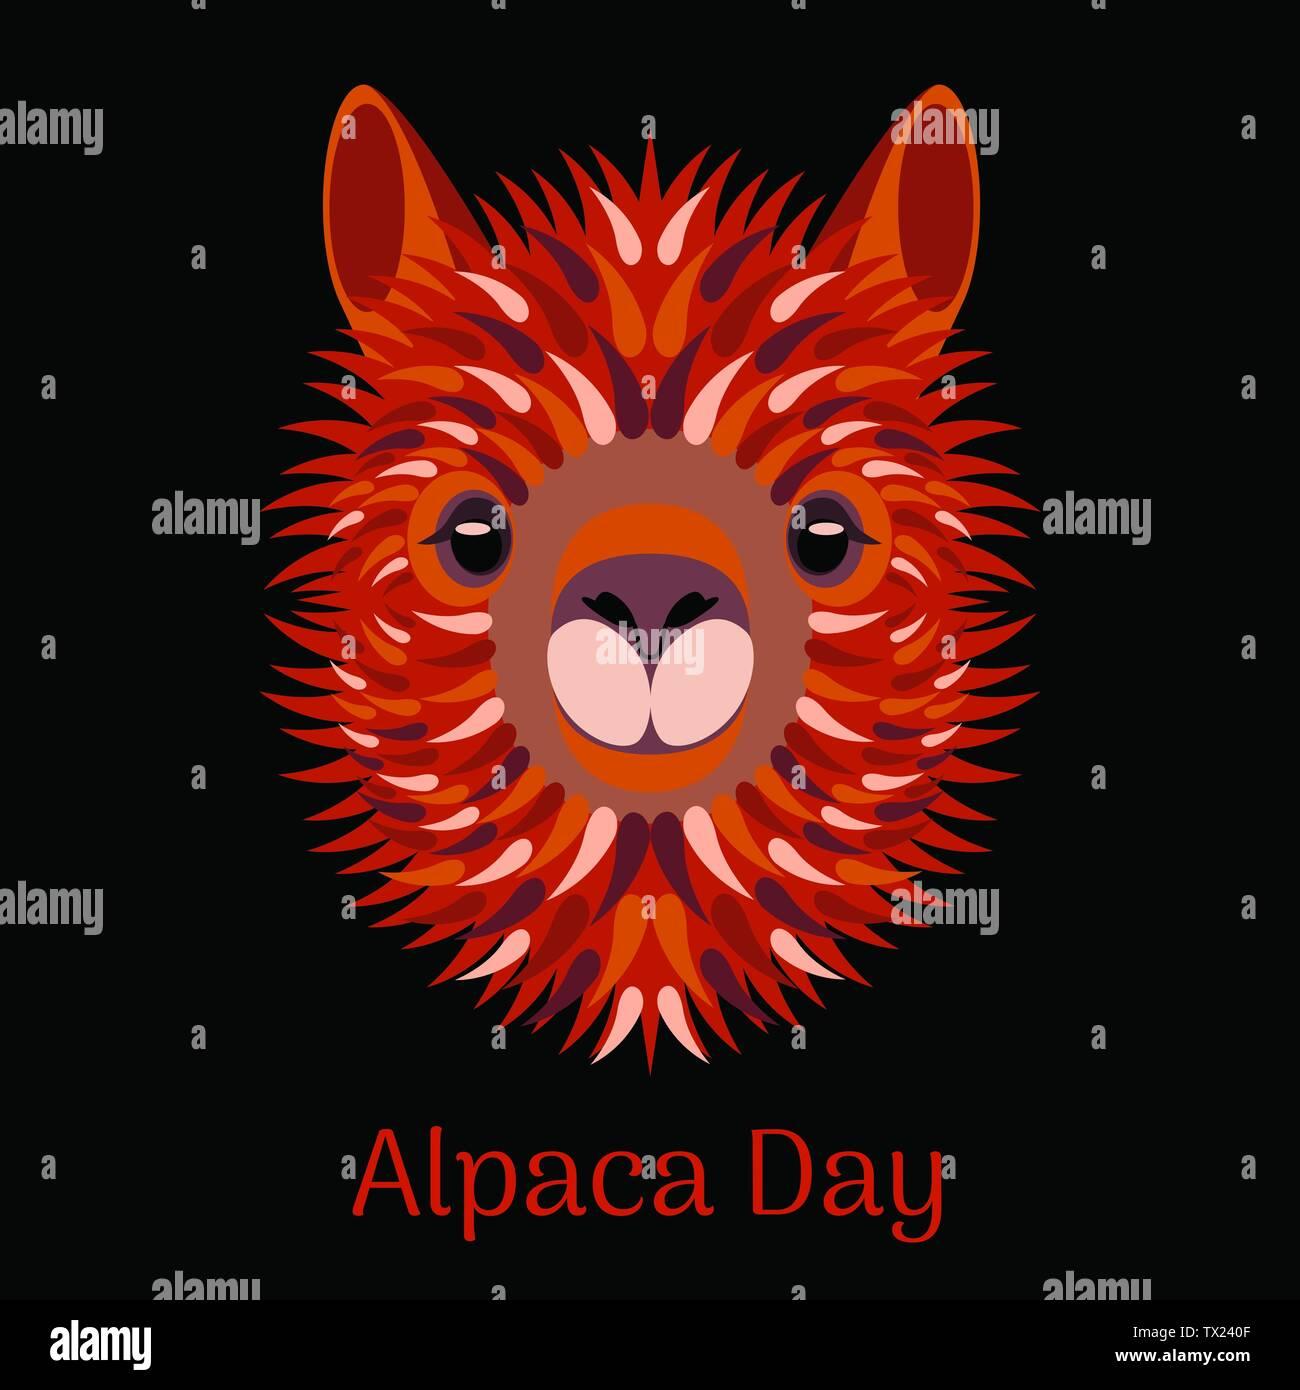 Alpaca Day. National holiday in Peru. Head, face, alpaca portrait - Stock Vector